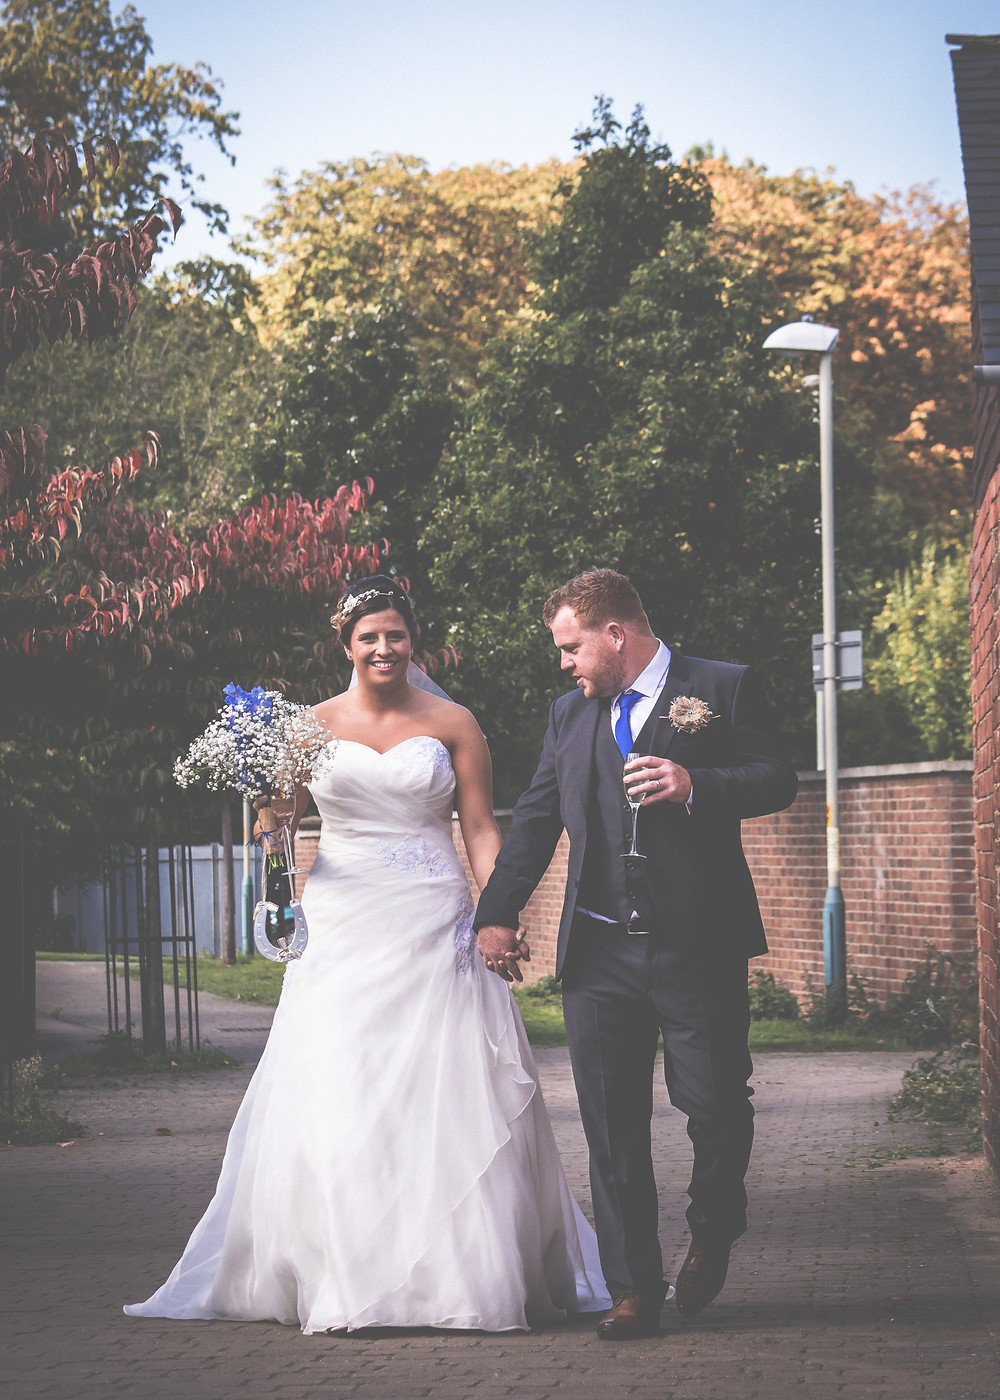 Bride and Groom Vita Vestra Wedding Photography Cheltenham, Gloucestershire